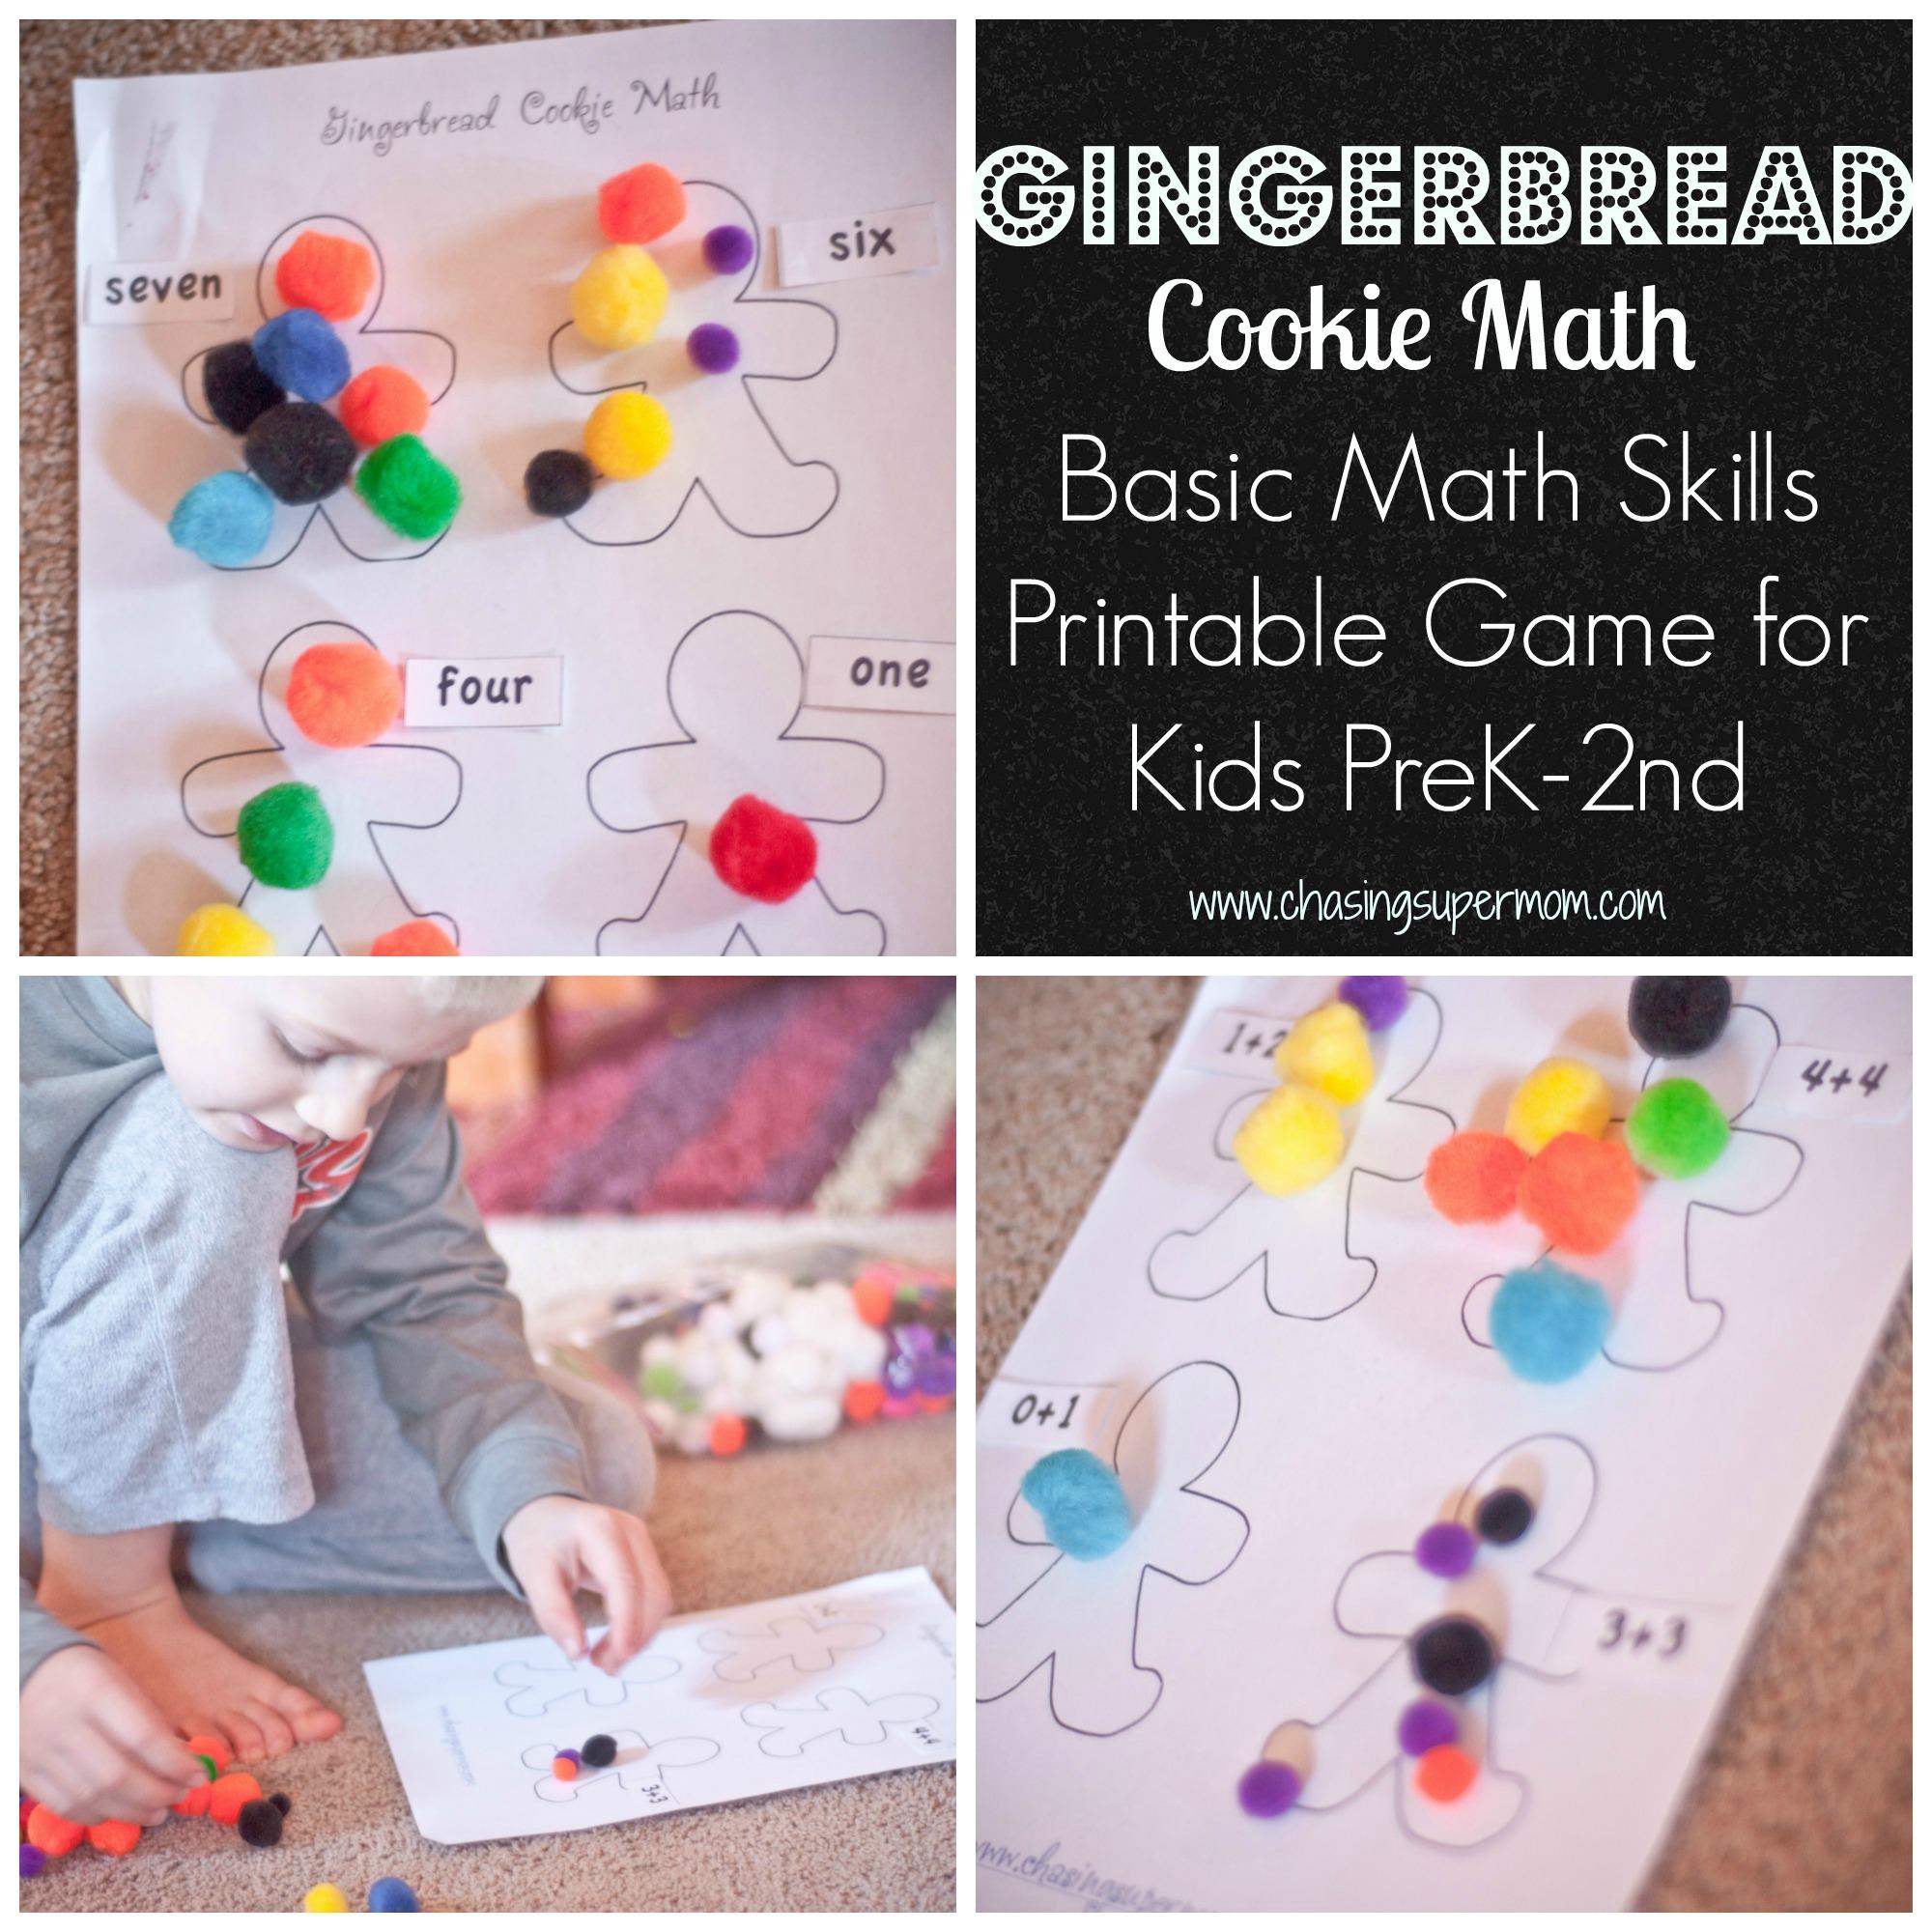 Gingerbread Cookie Math – Basic Math Skills Printable Game for Kids PreK-2nd